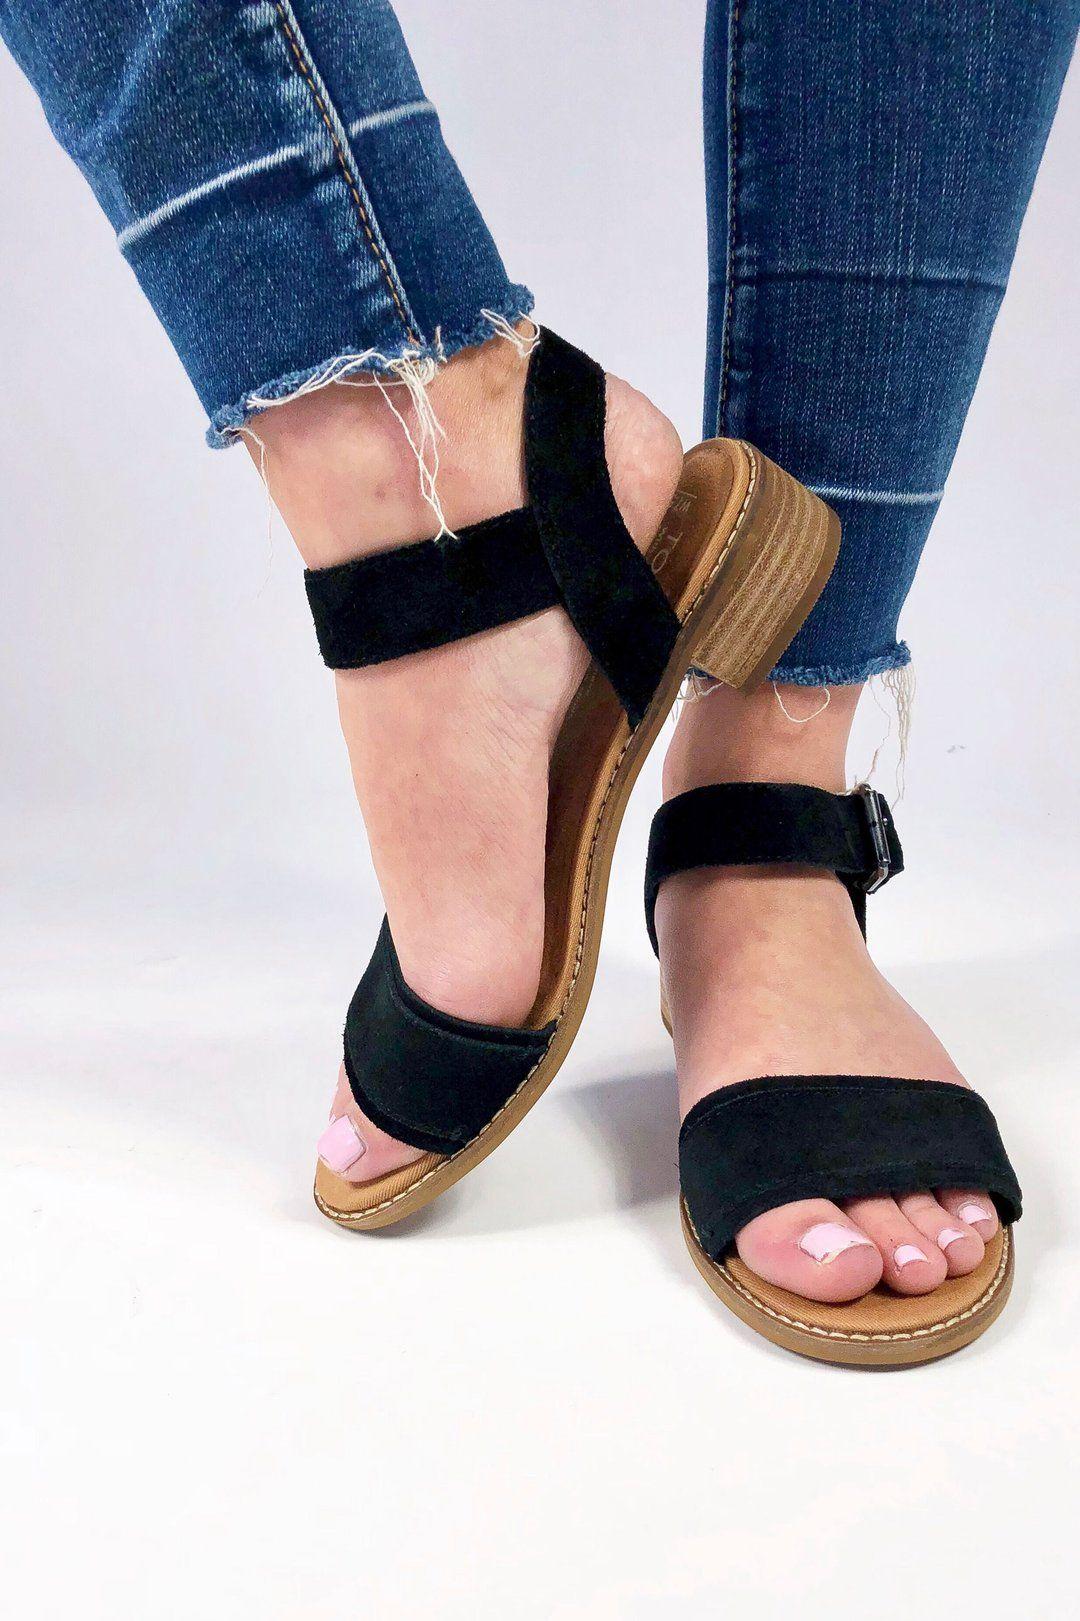 32973eaac3d62 TOMS Black Suede Camilia Sandals in 2019 | Apparel Box | Shoes ...